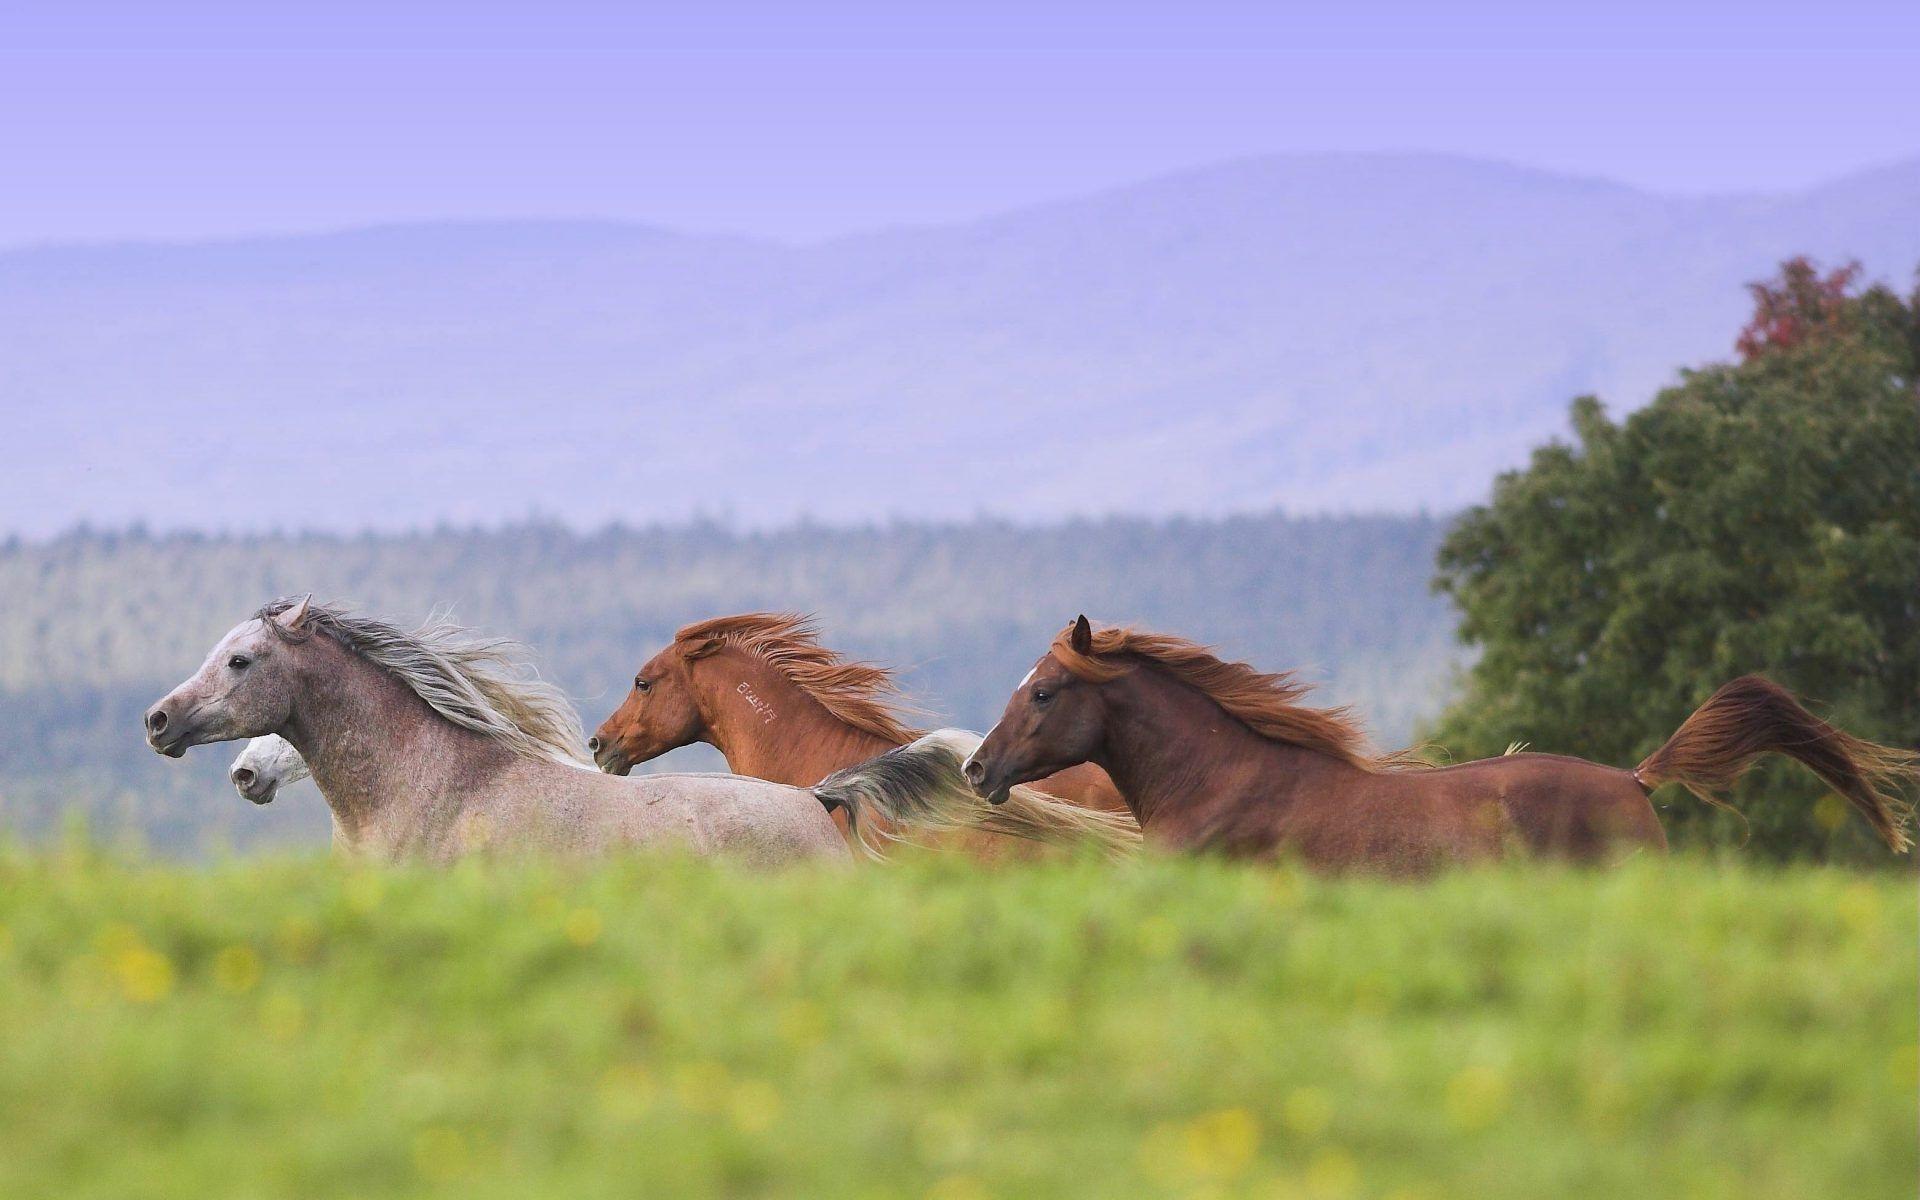 Src Wild Horses Wallpaper Samsung Data Id Stallion 1920x1200 Download Hd Wallpaper Wallpapertip